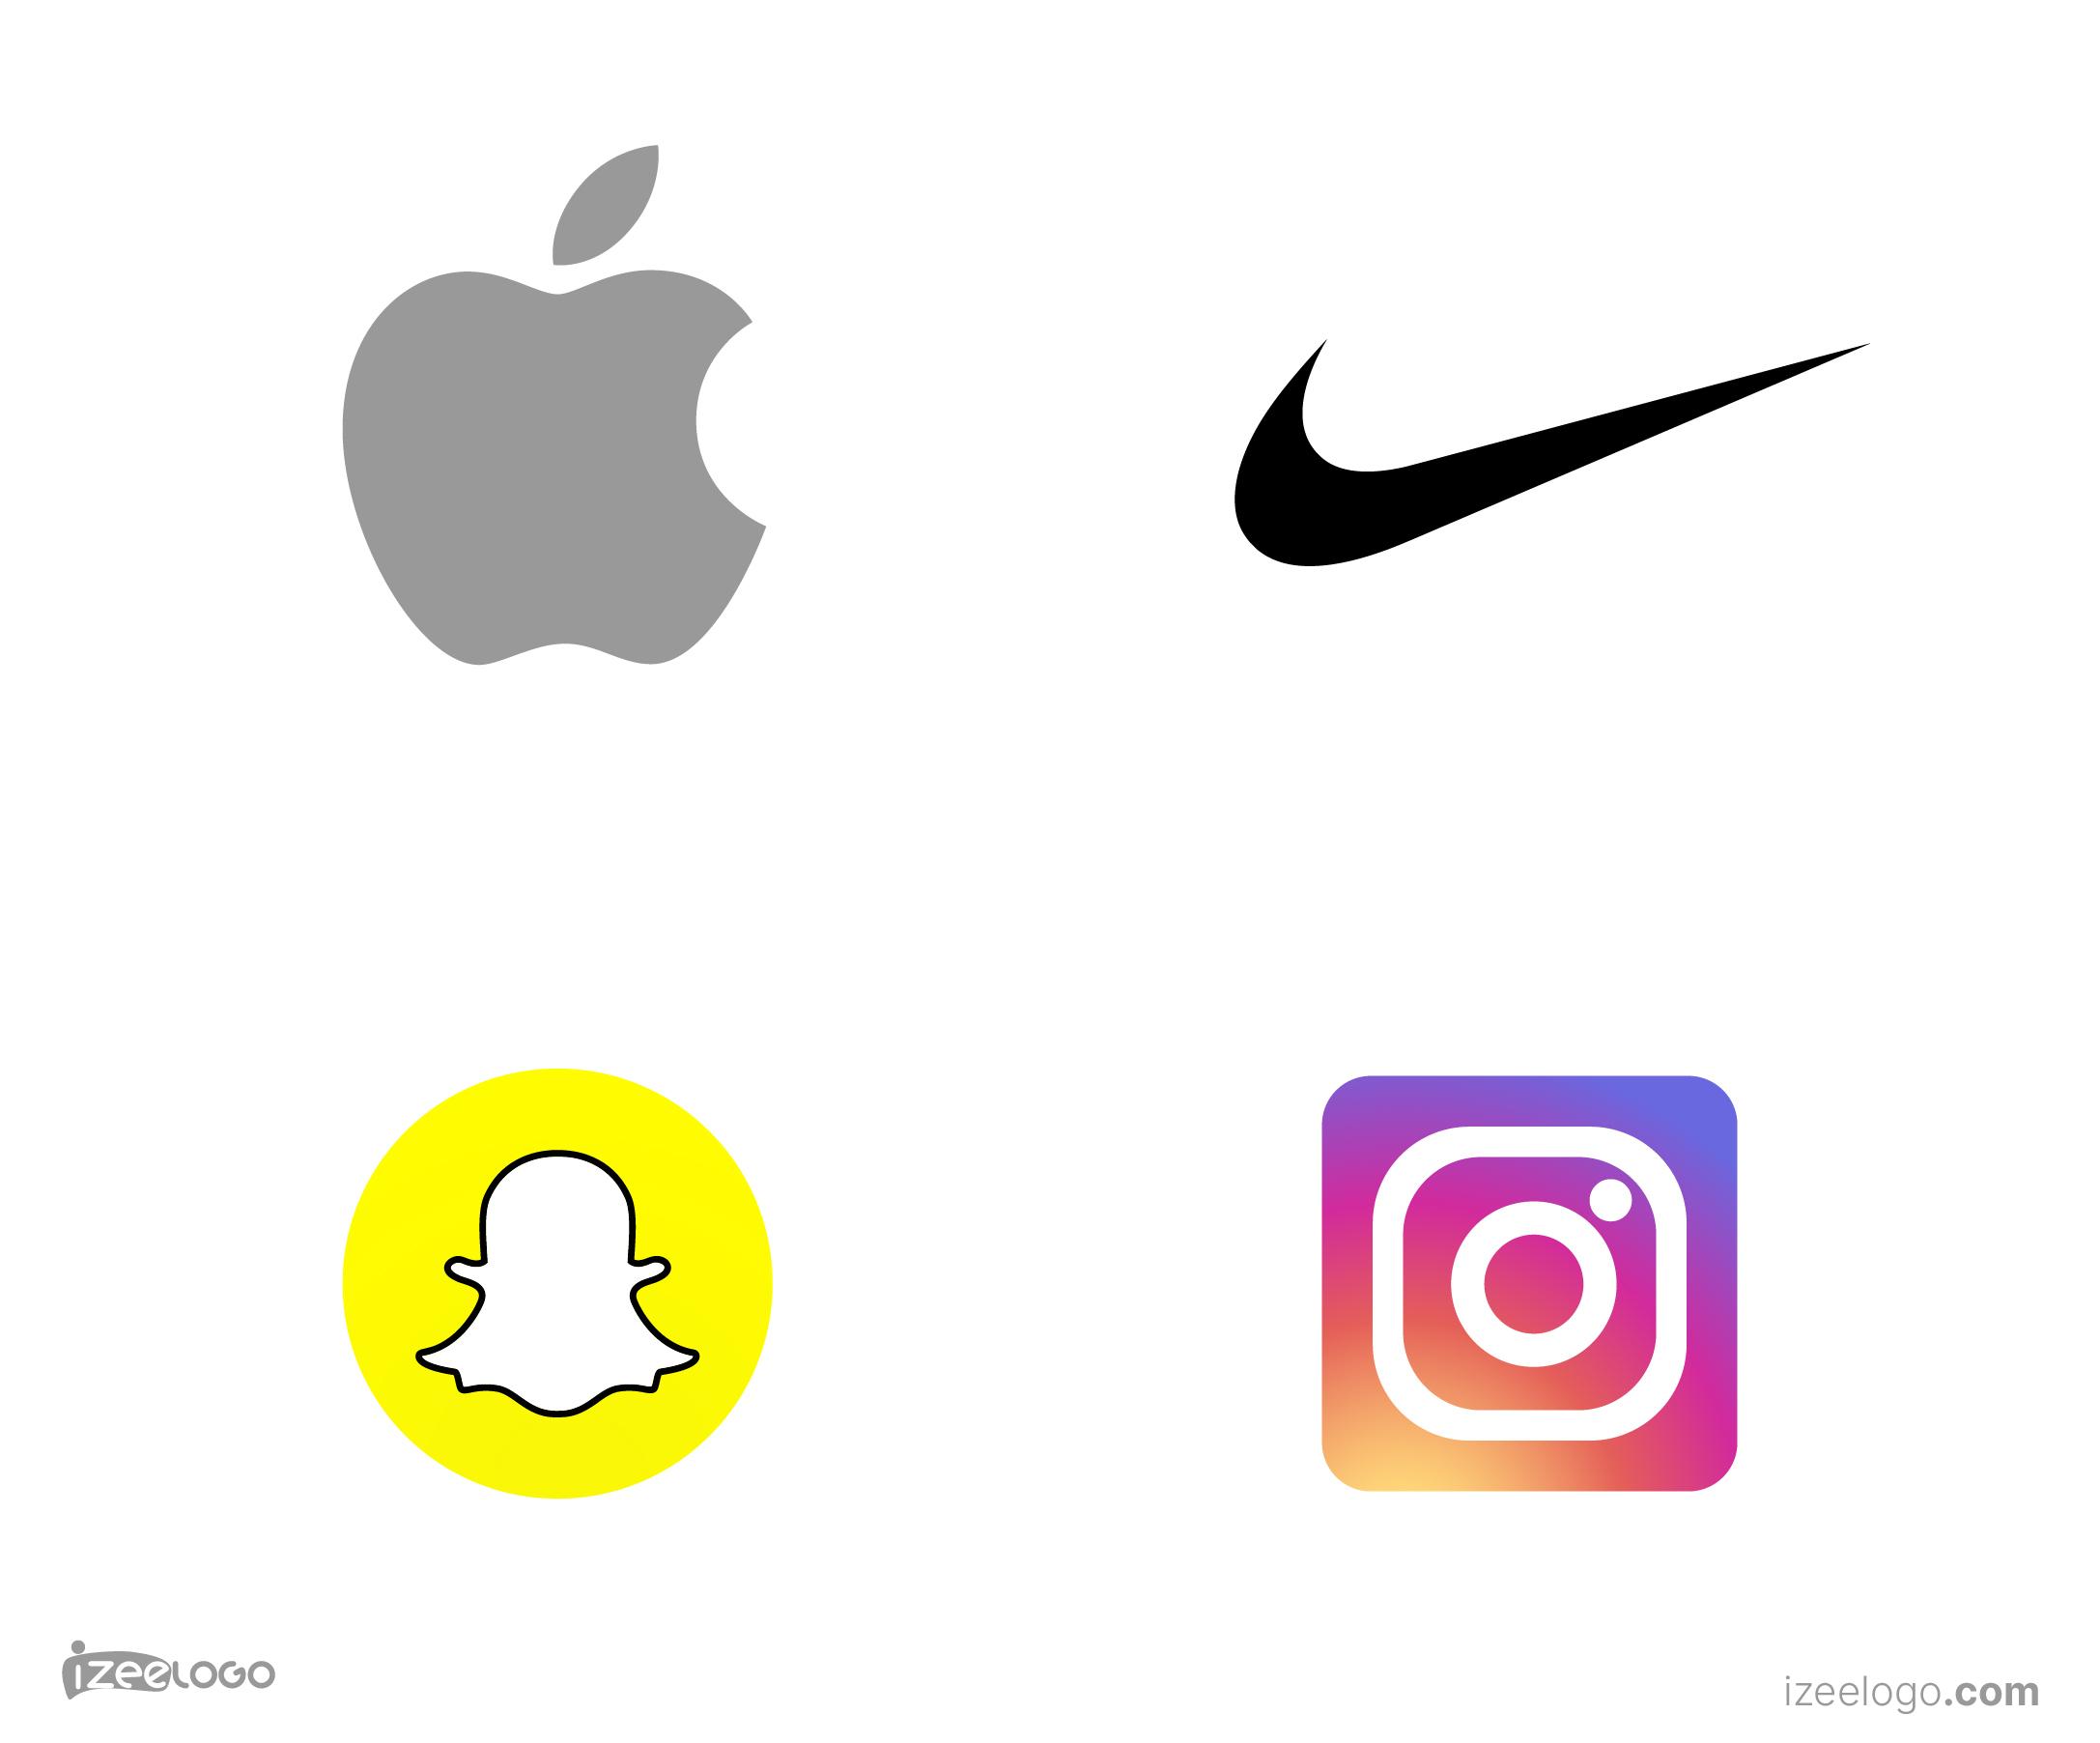 Ideas de logos isotipo: logo Apple, logo Nike, logo Snapchat, logo Instagram